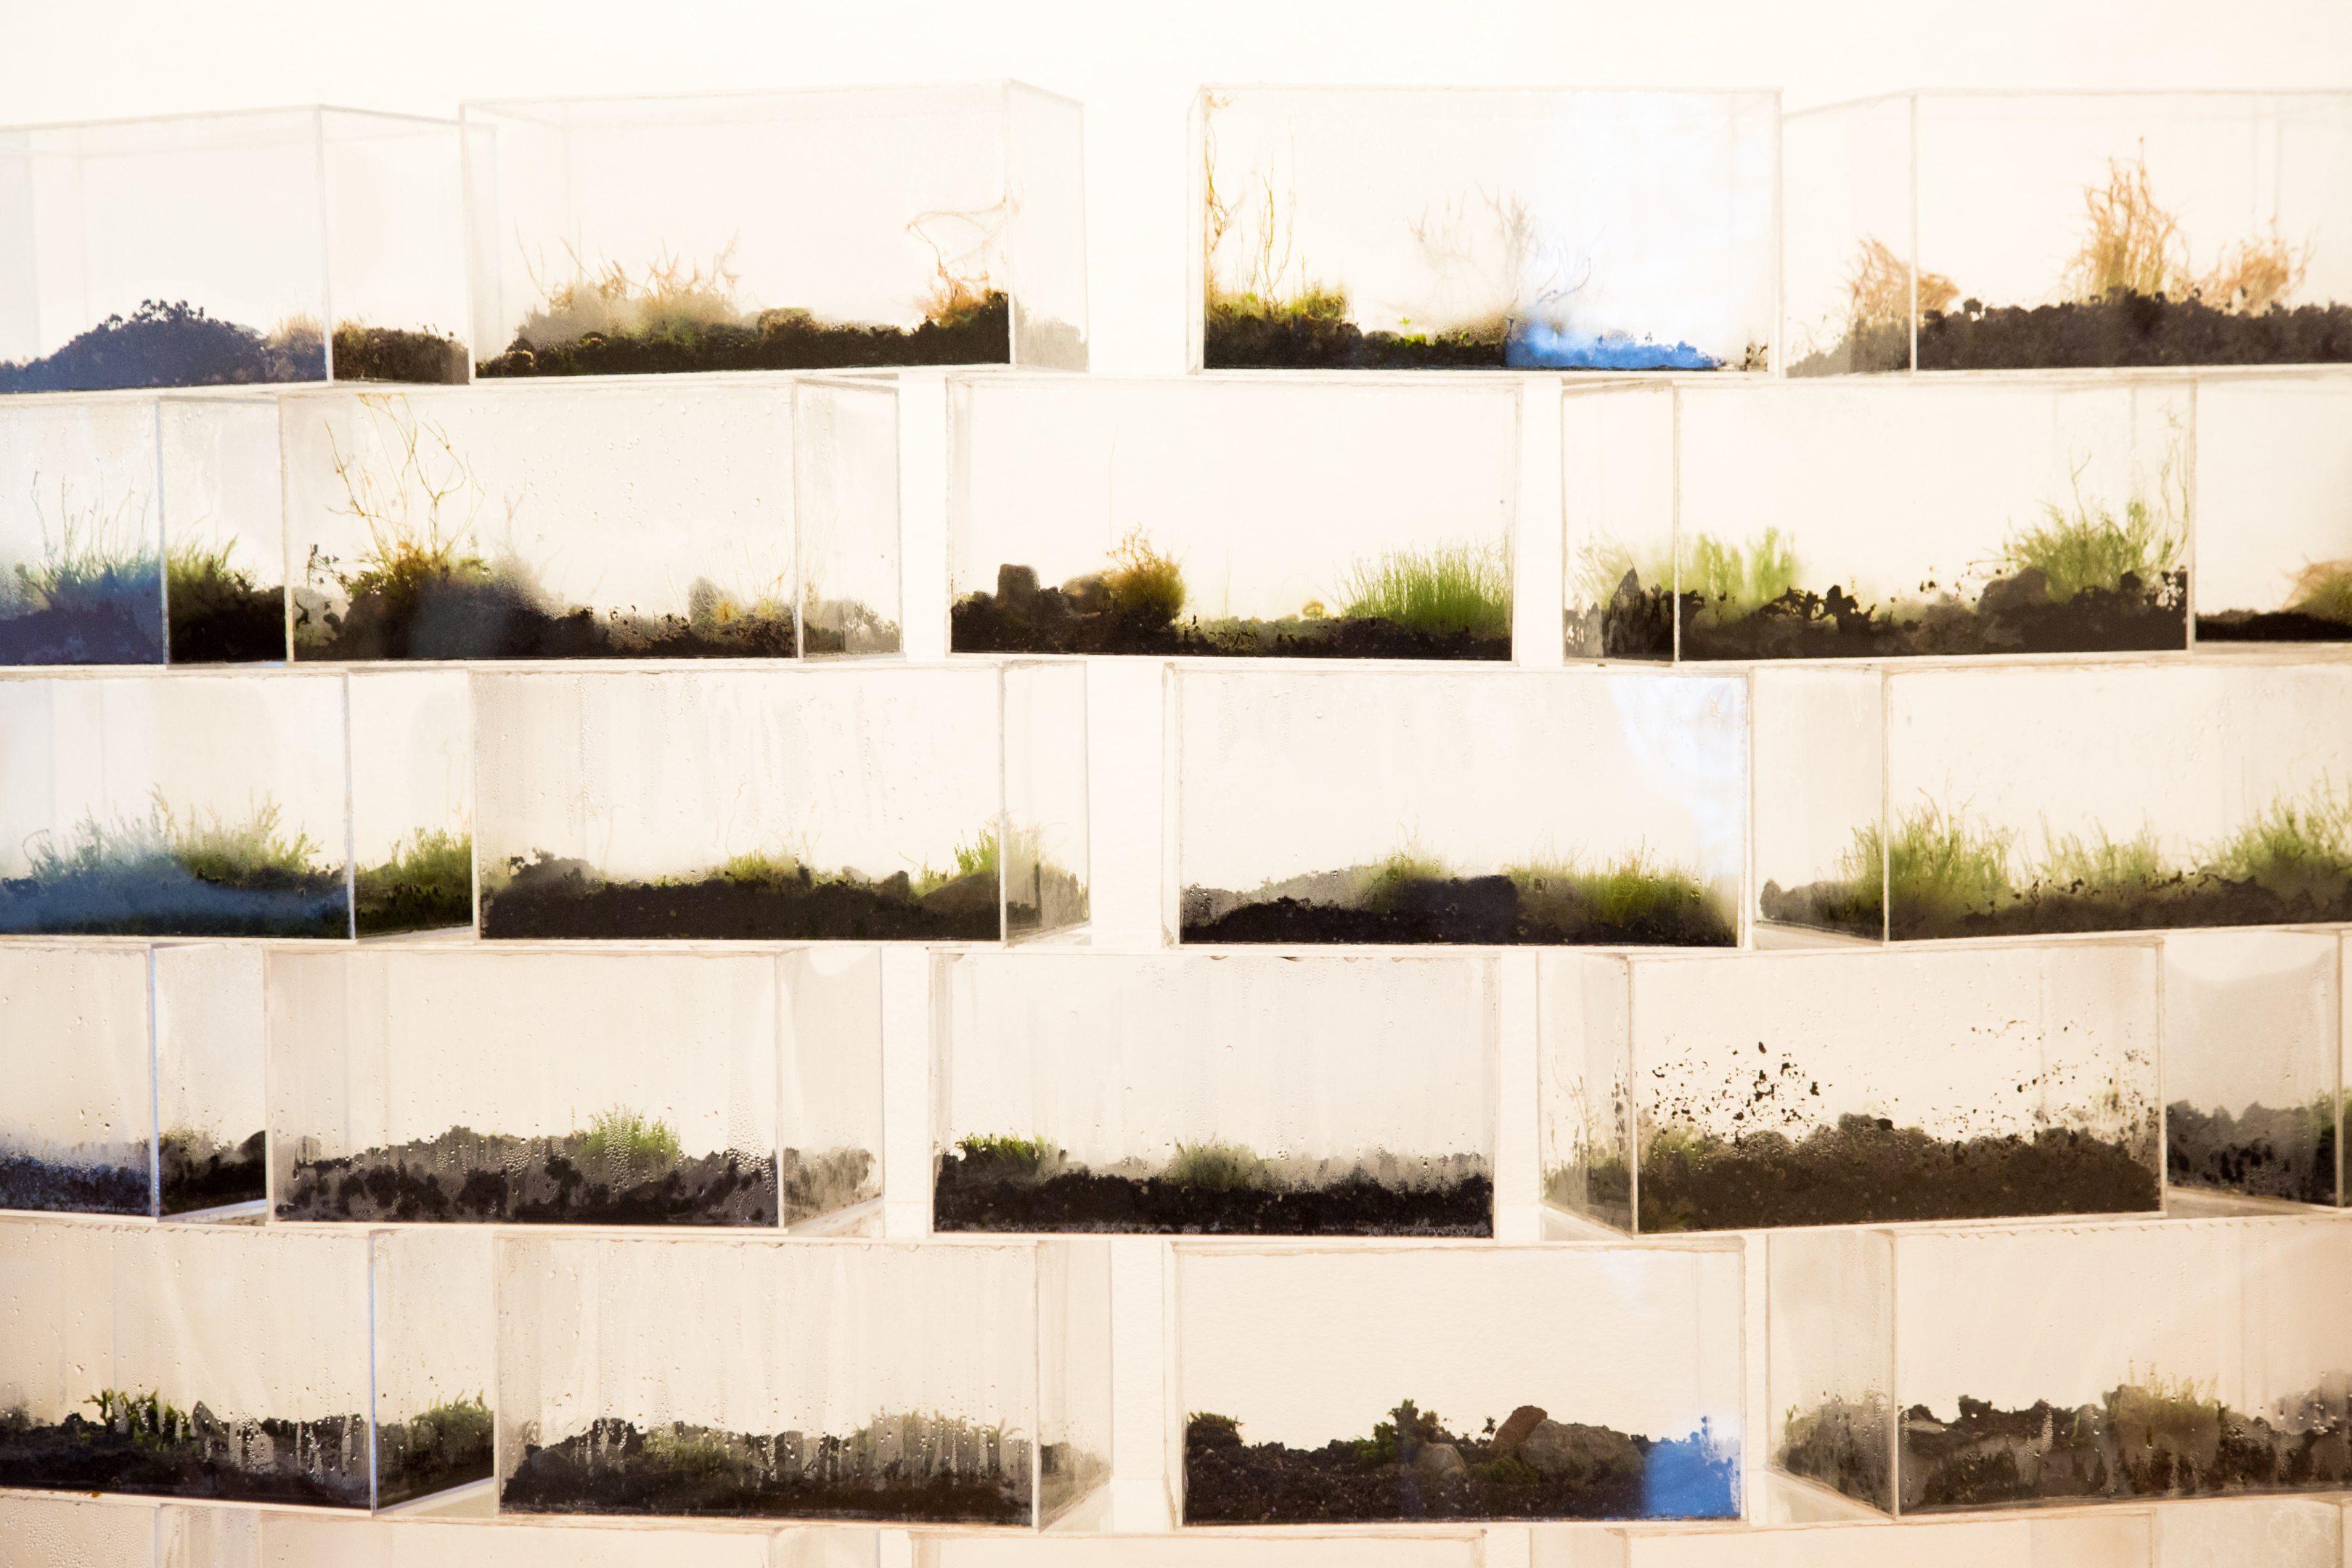 toronto-art-the-gladstone-hotel-grow-op-2017-rewilding-melanie-billark